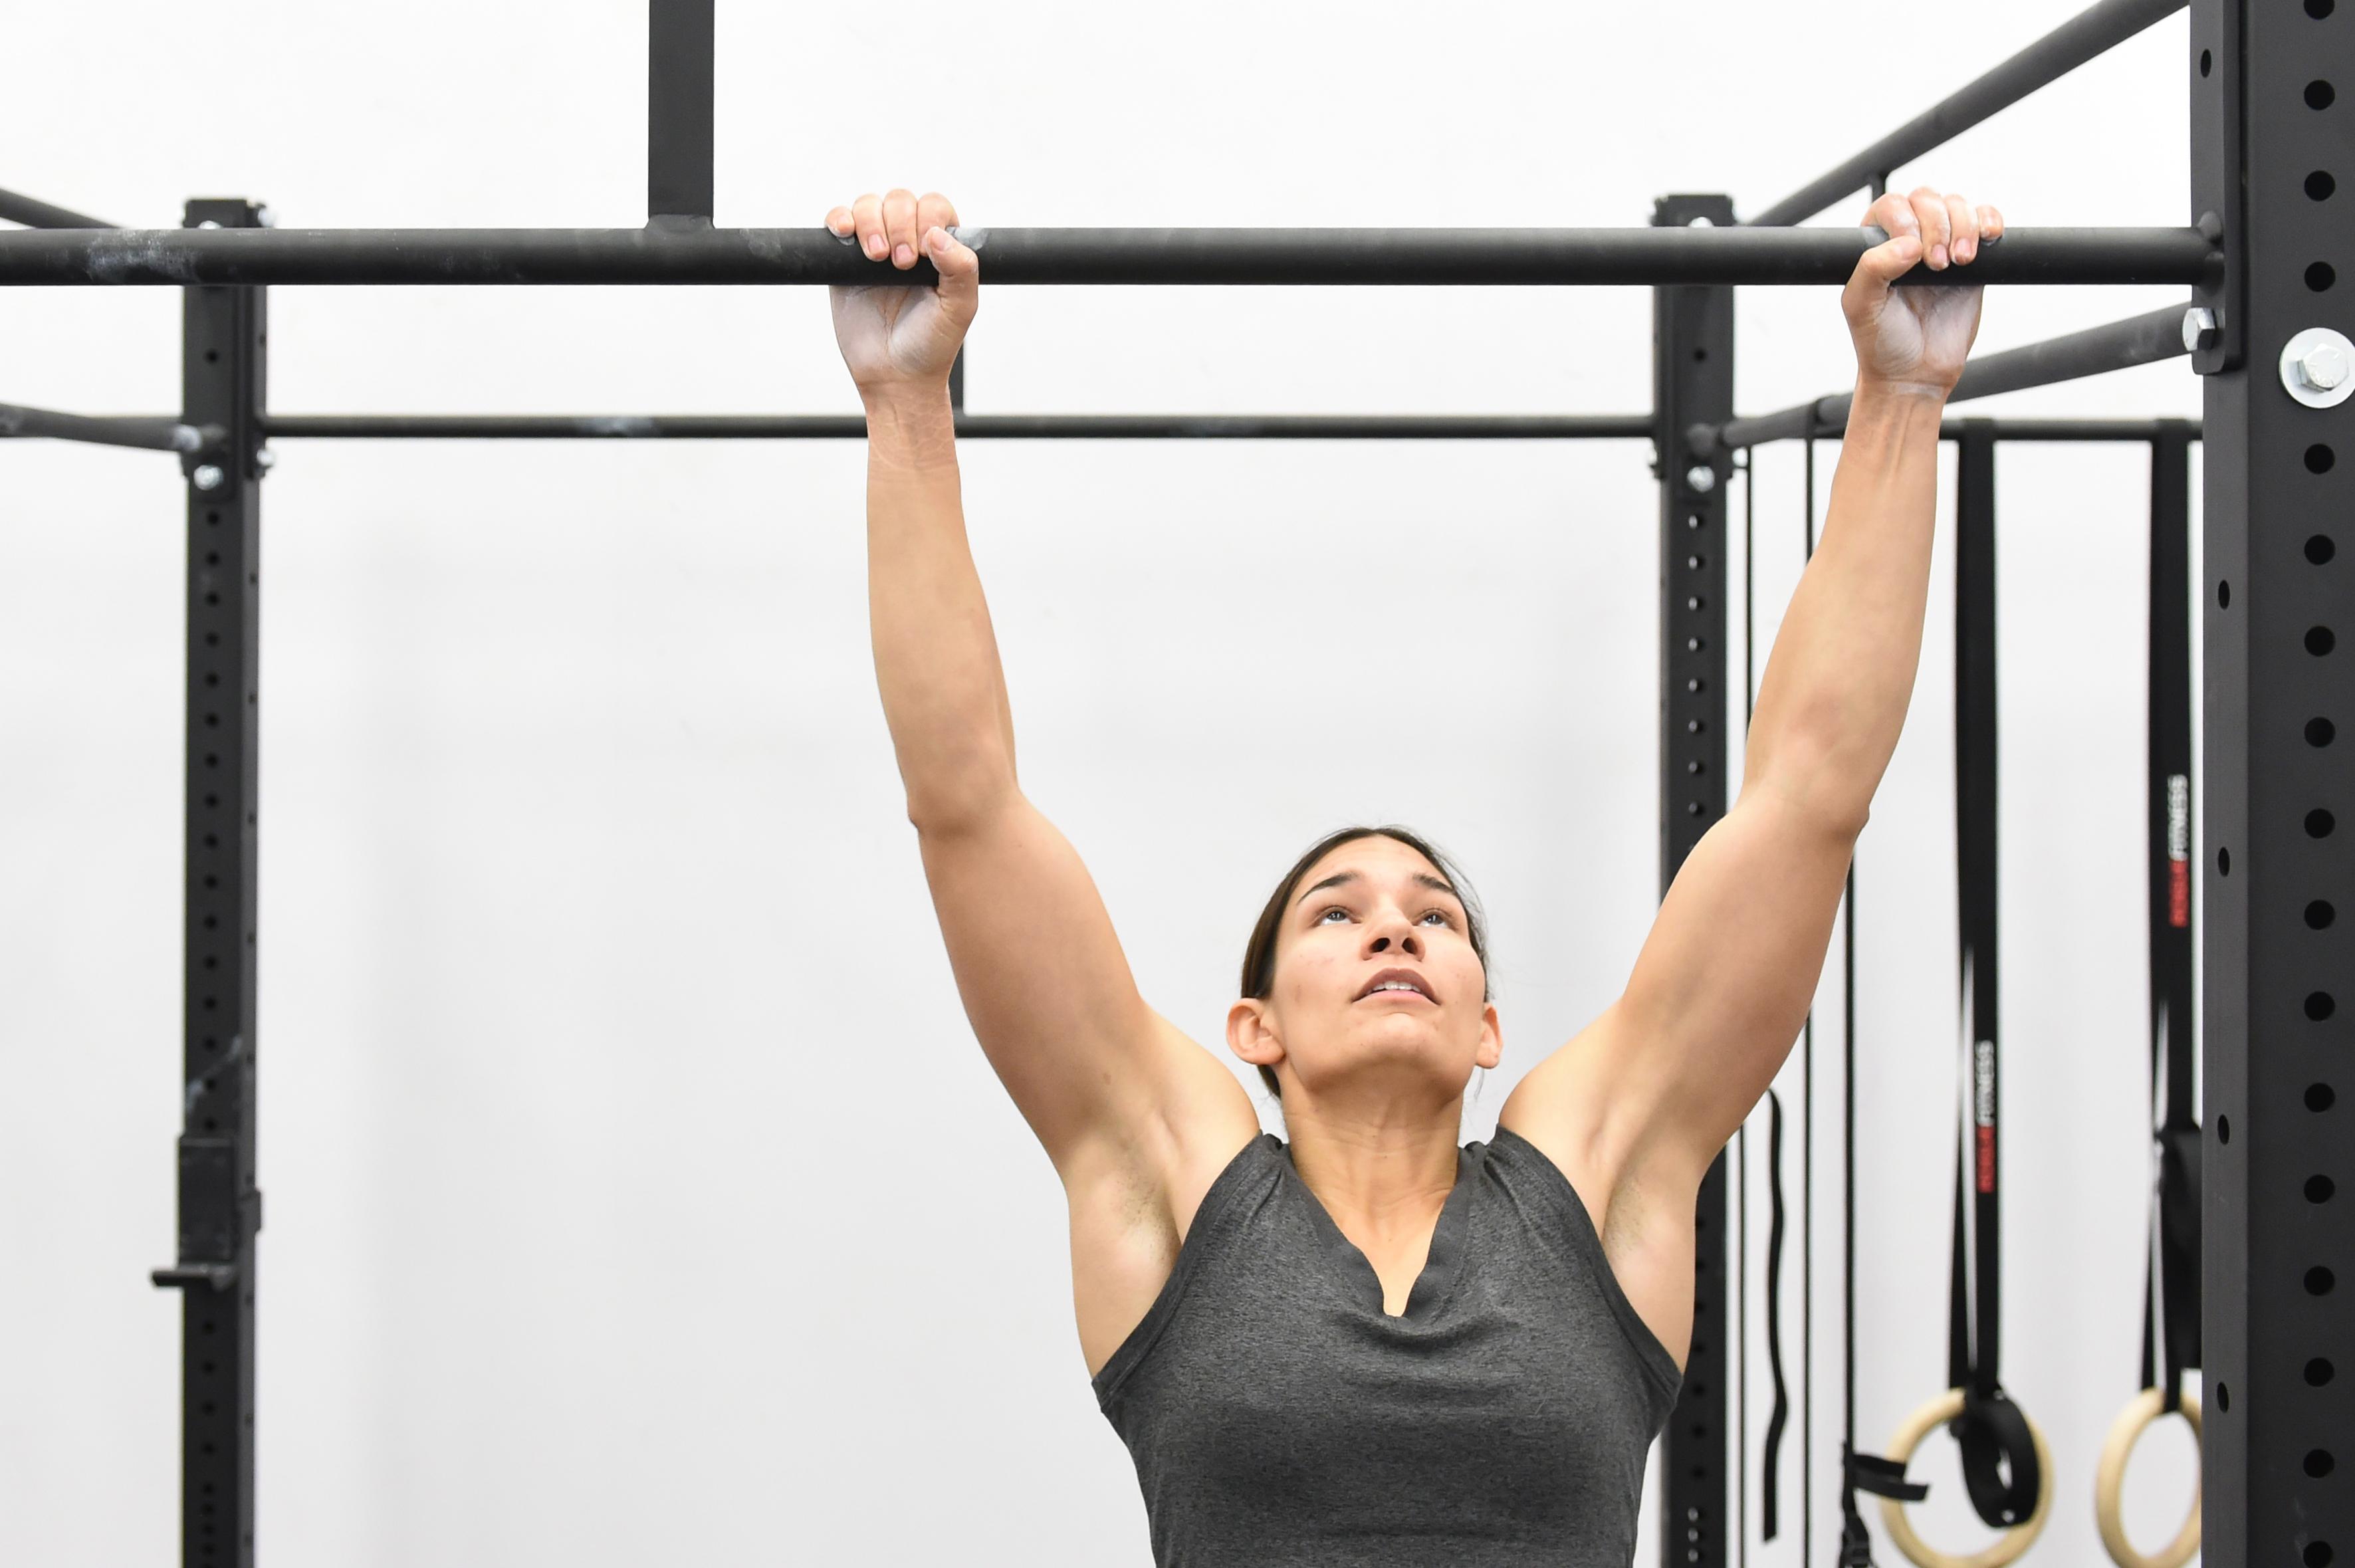 5 Easy Pull Up Bar Exercises For Beginners | RDX Sports Blog